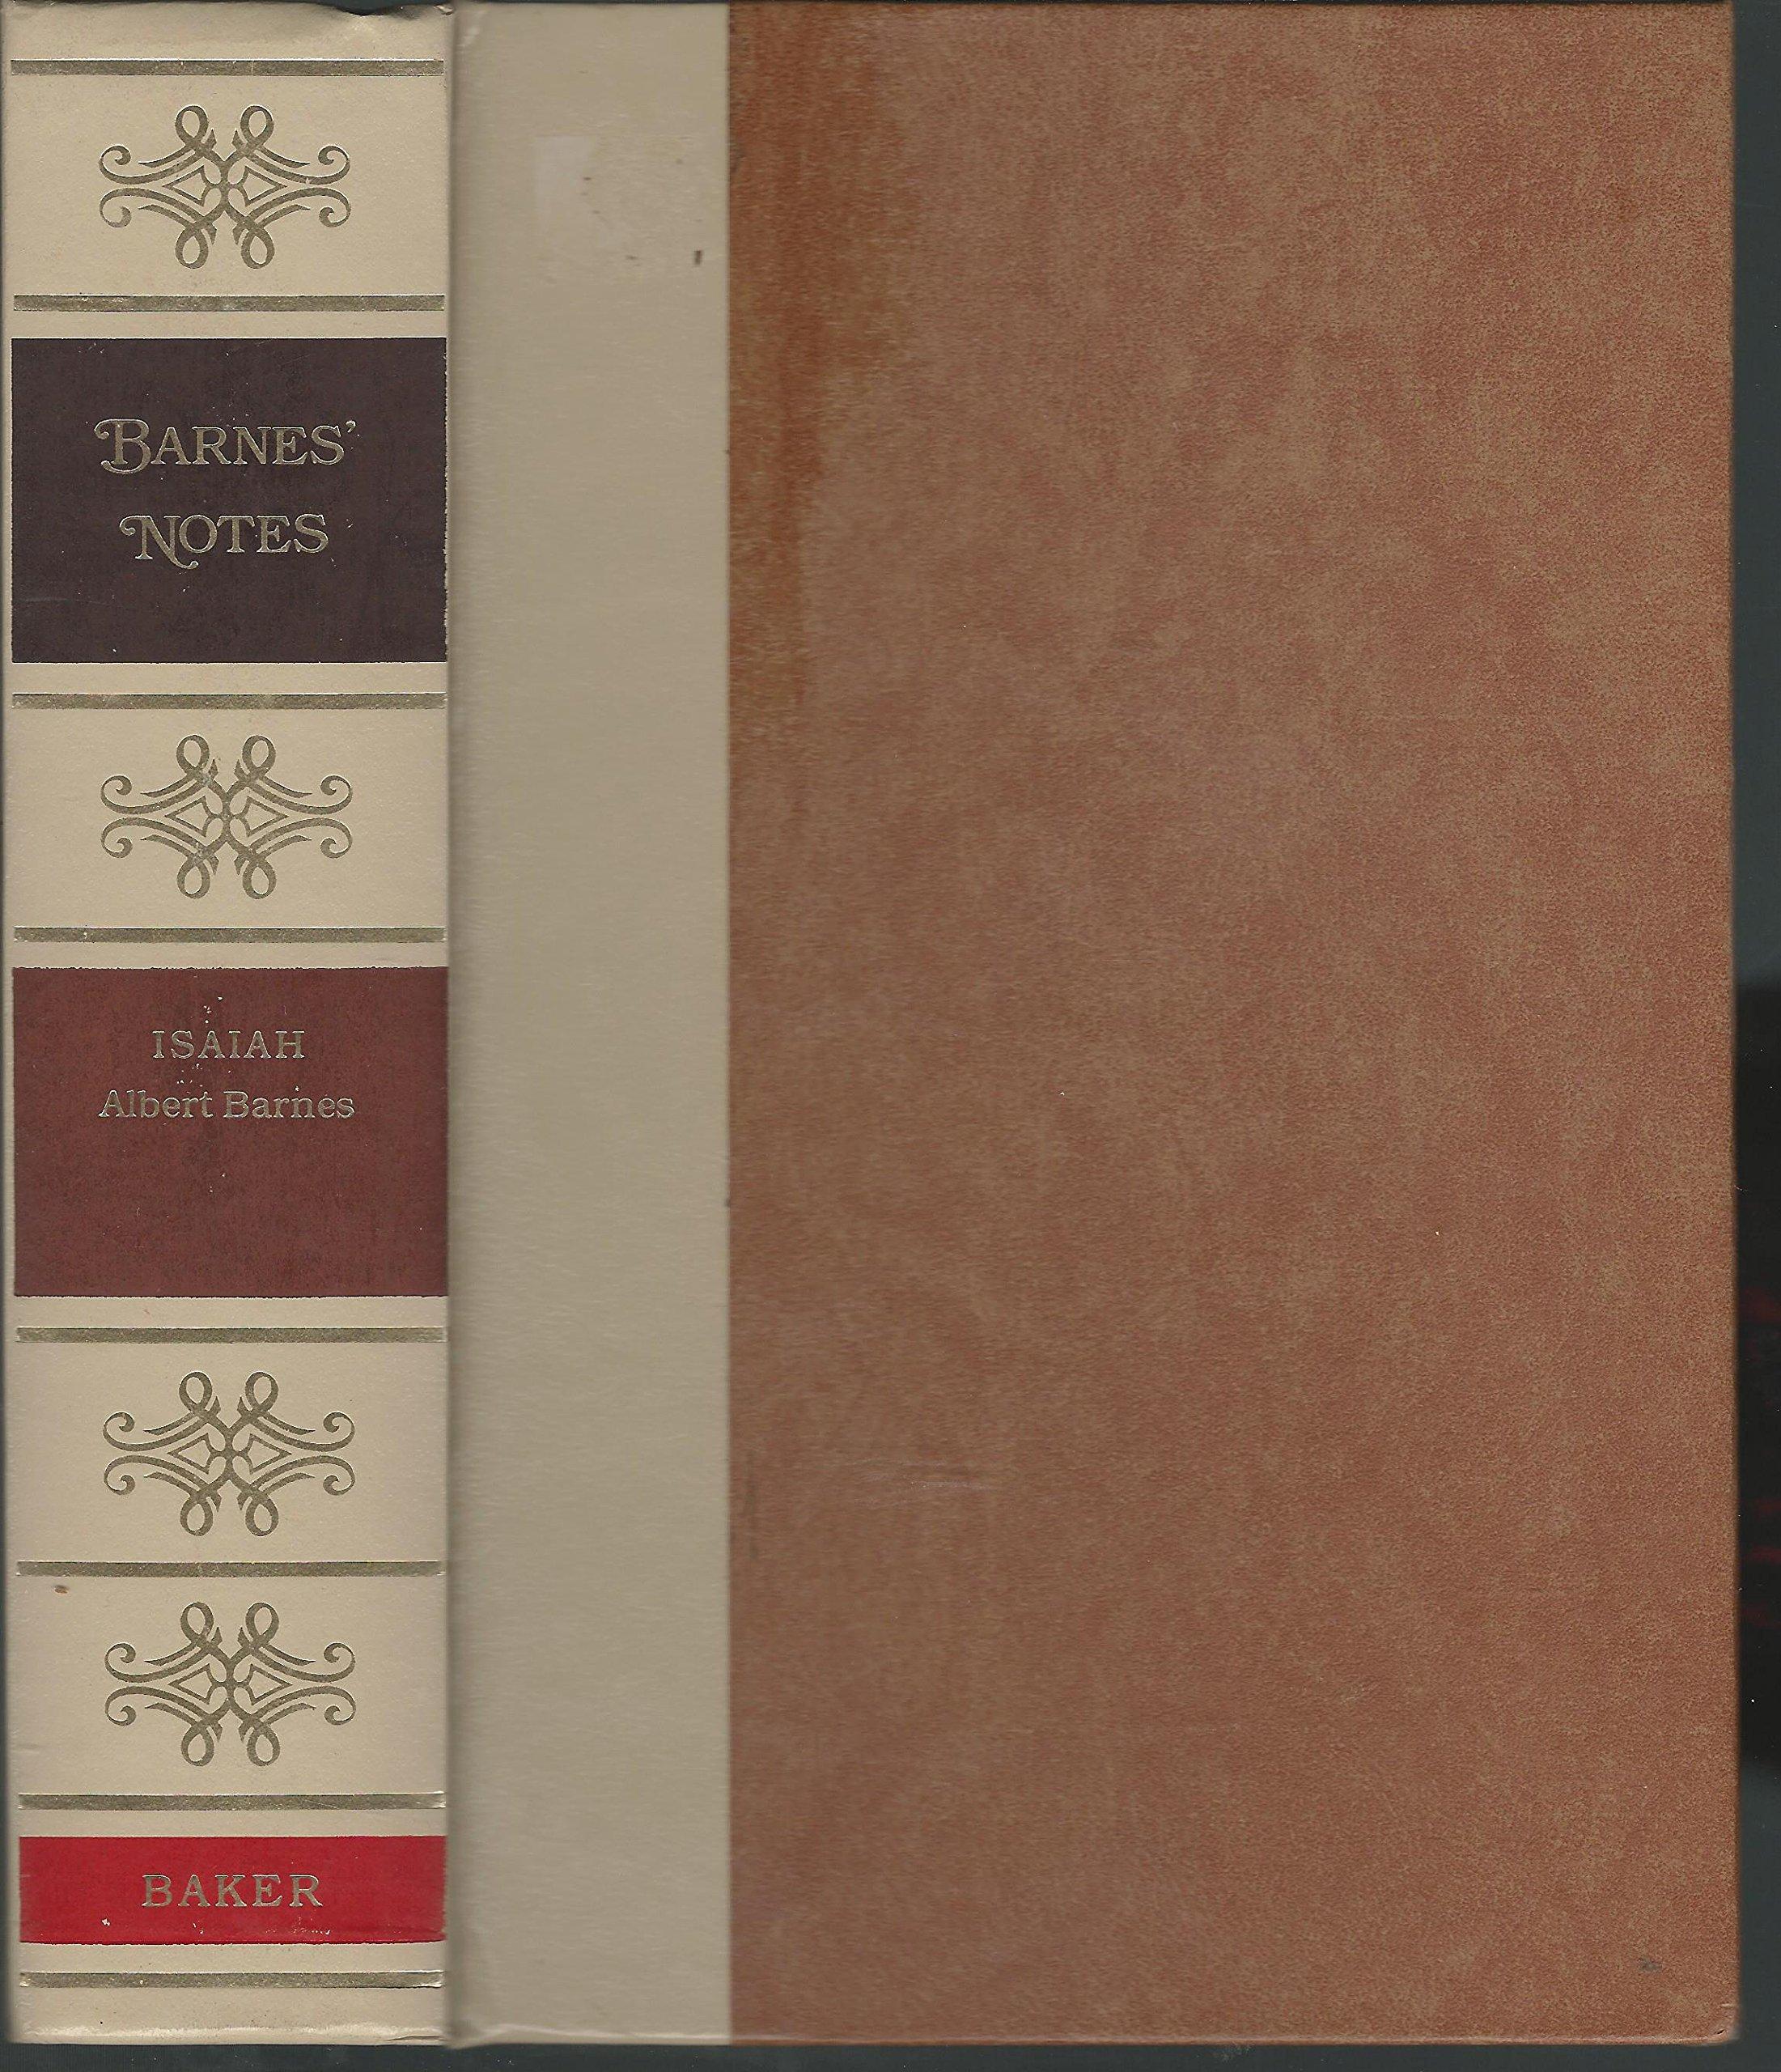 Barnes Notes on the Old Testament Isaiah: Albert Barnes